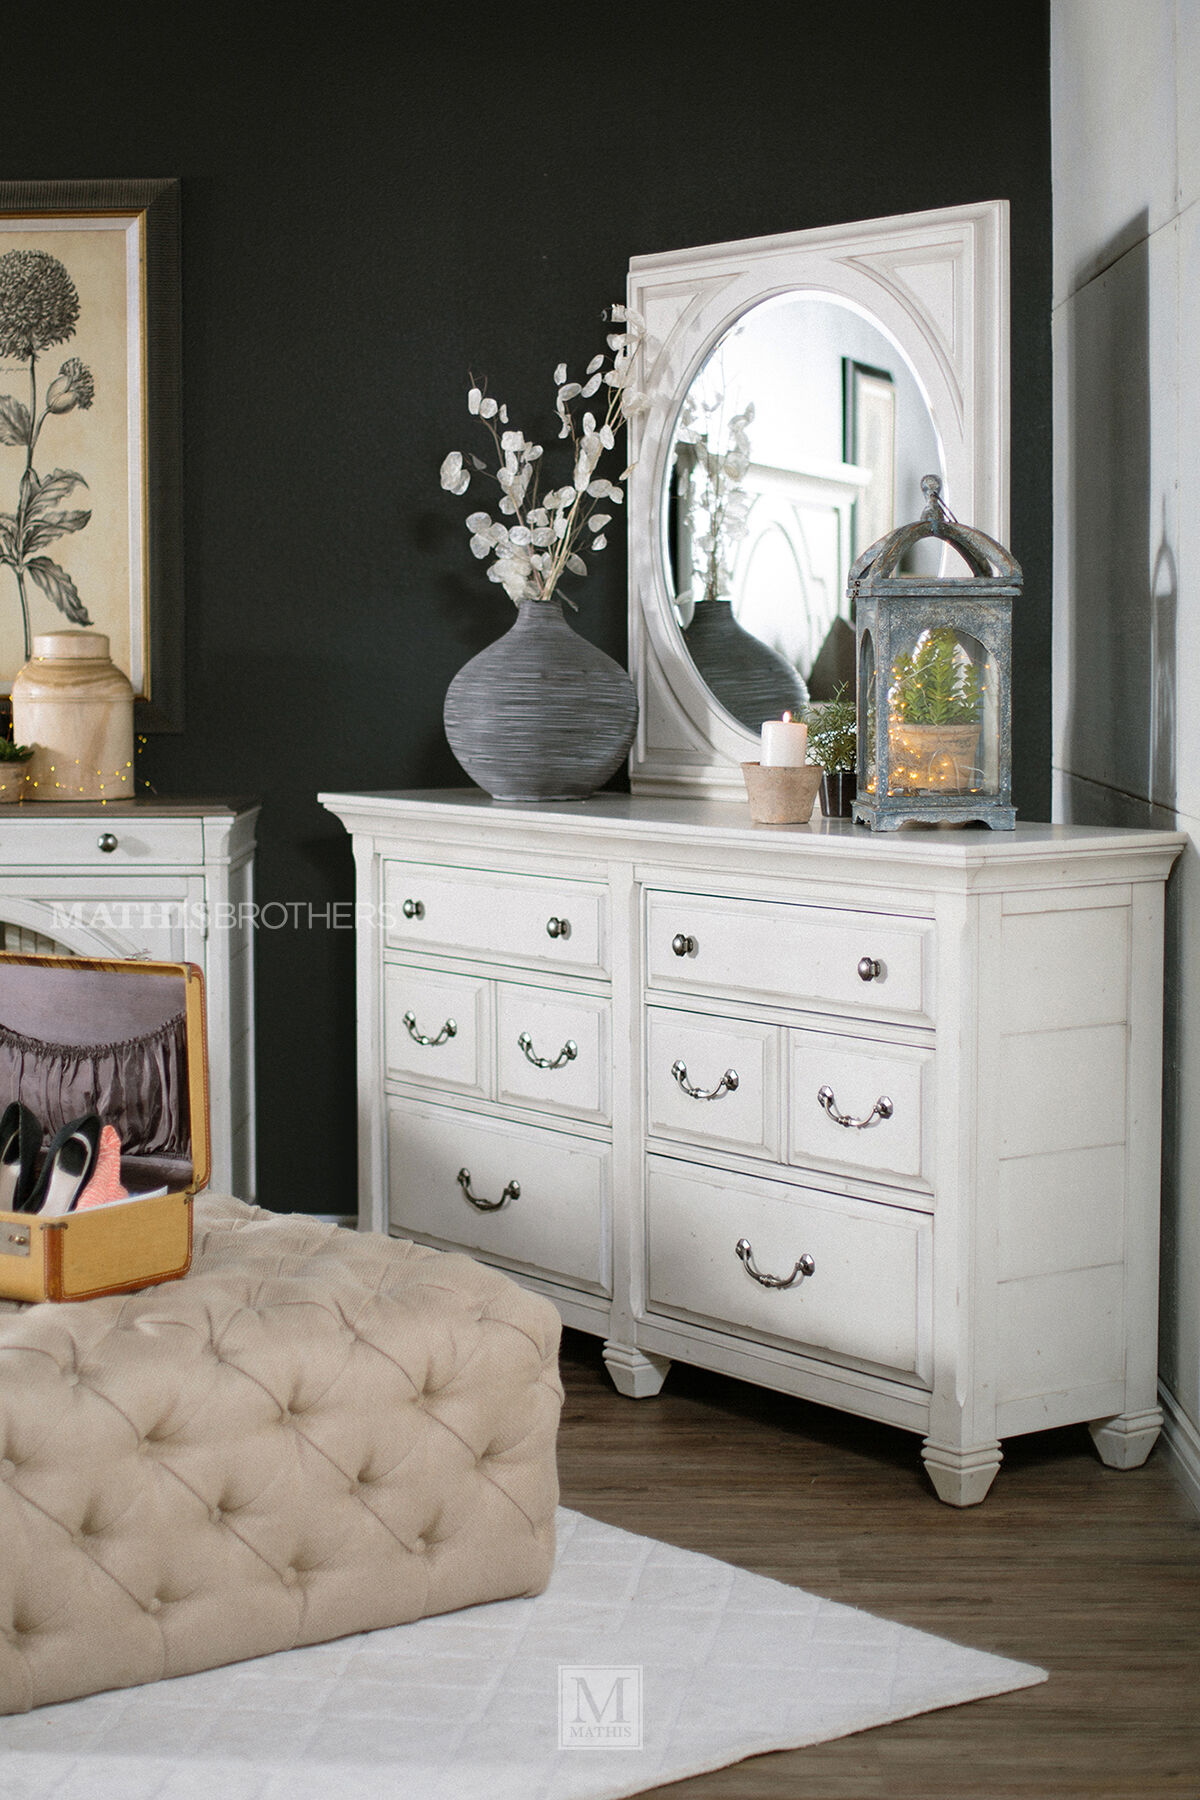 magnussen home hancock park suite - Magnussen Furniture